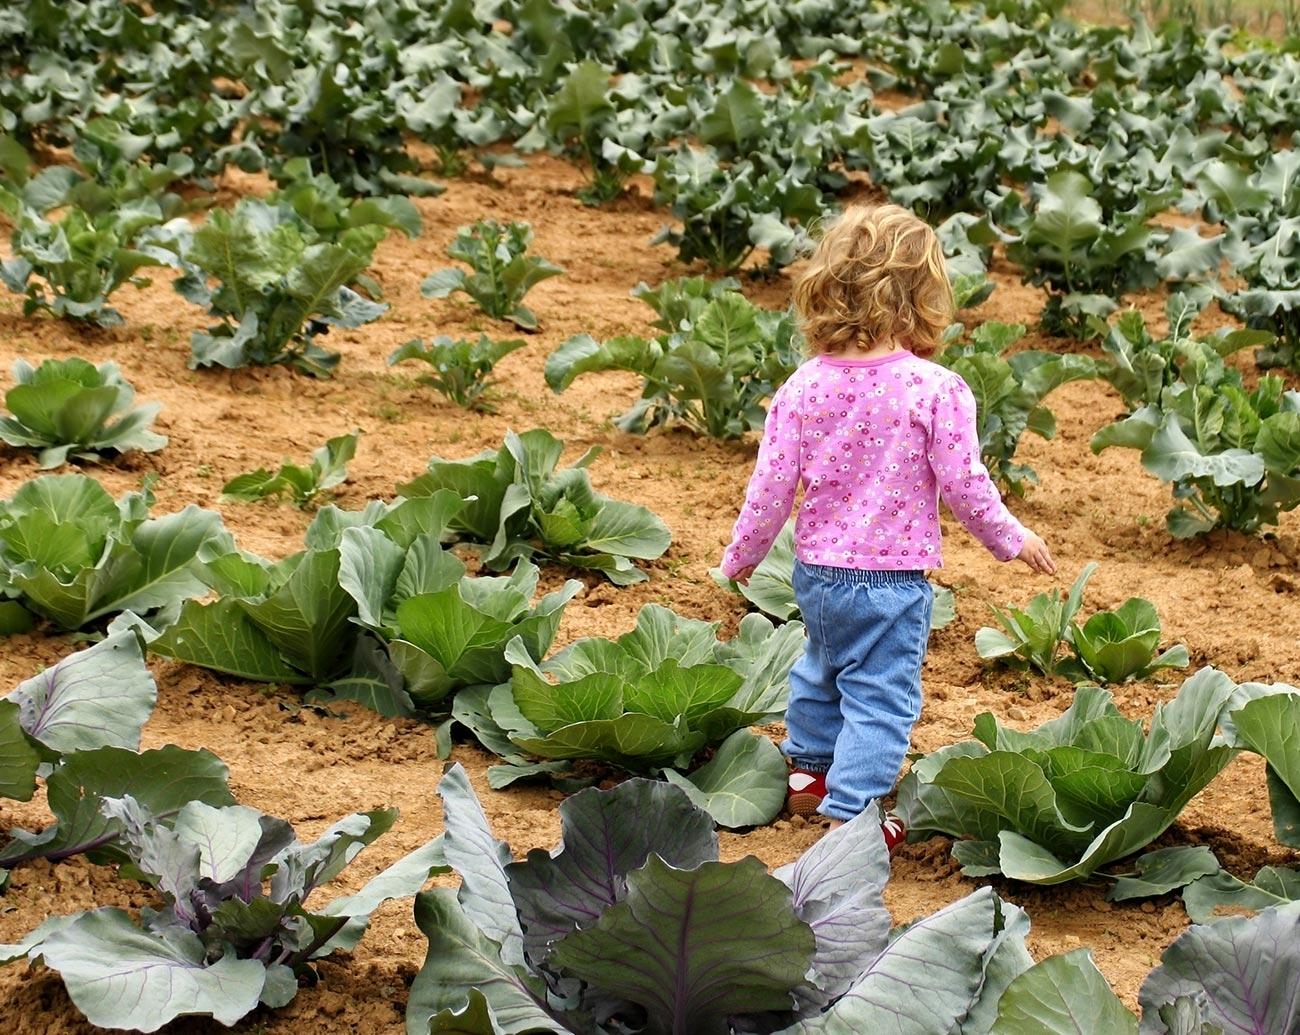 OPEN FARM EXPERIENCE